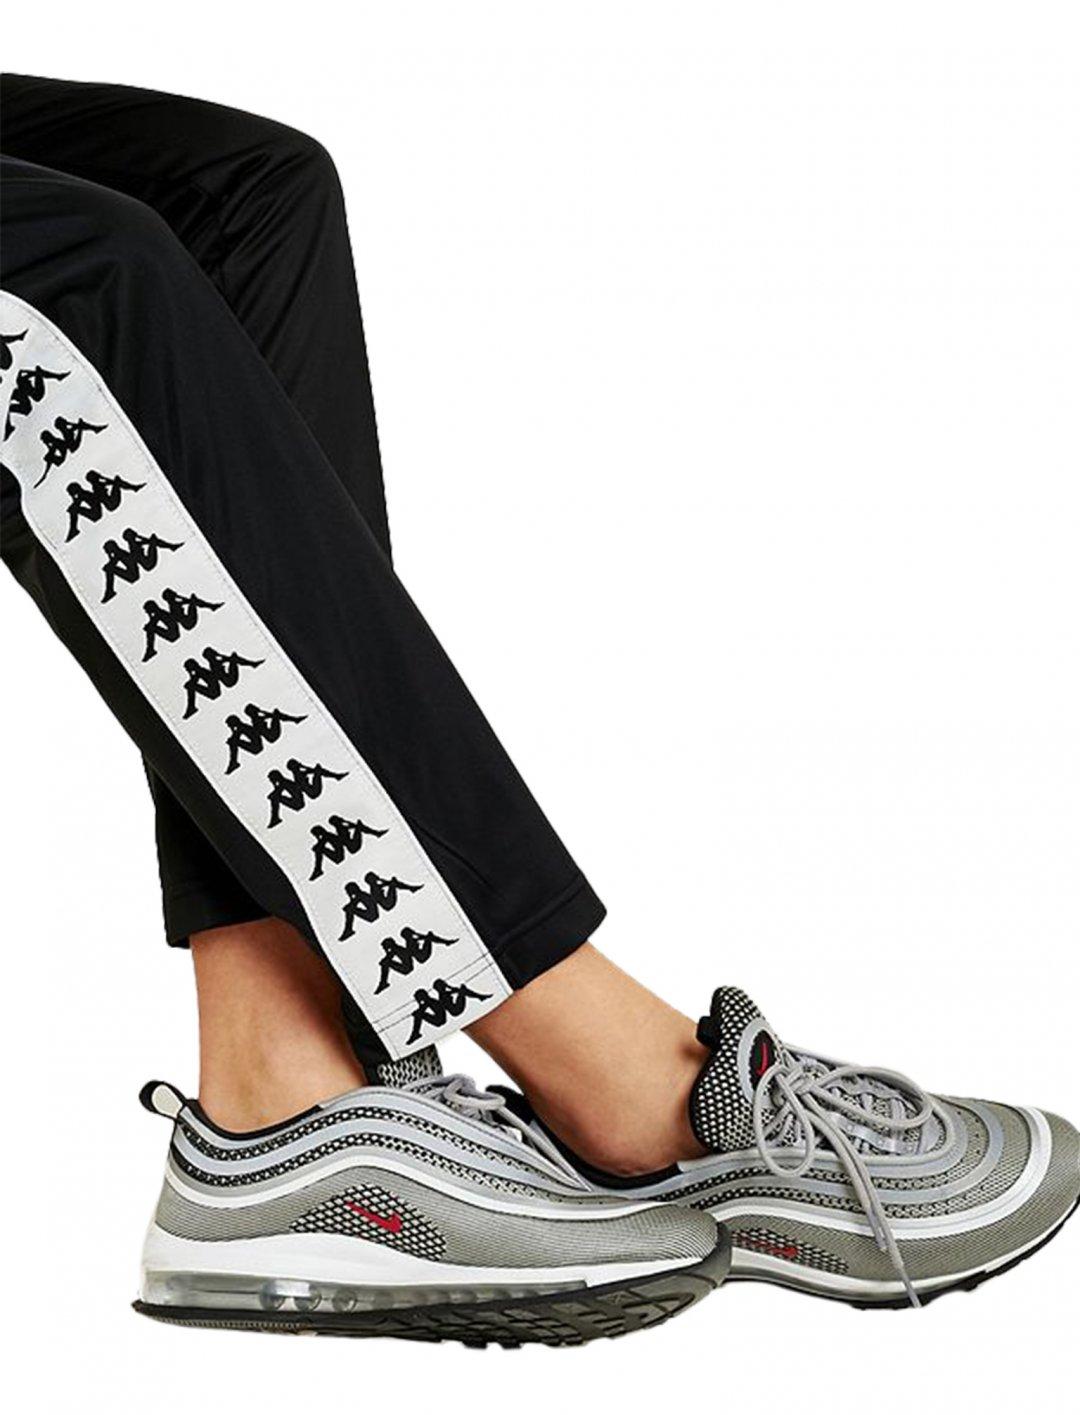 "Kappa Black Track Pants {""id"":5,""product_section_id"":1,""name"":""Clothing"",""order"":5} Kappa"